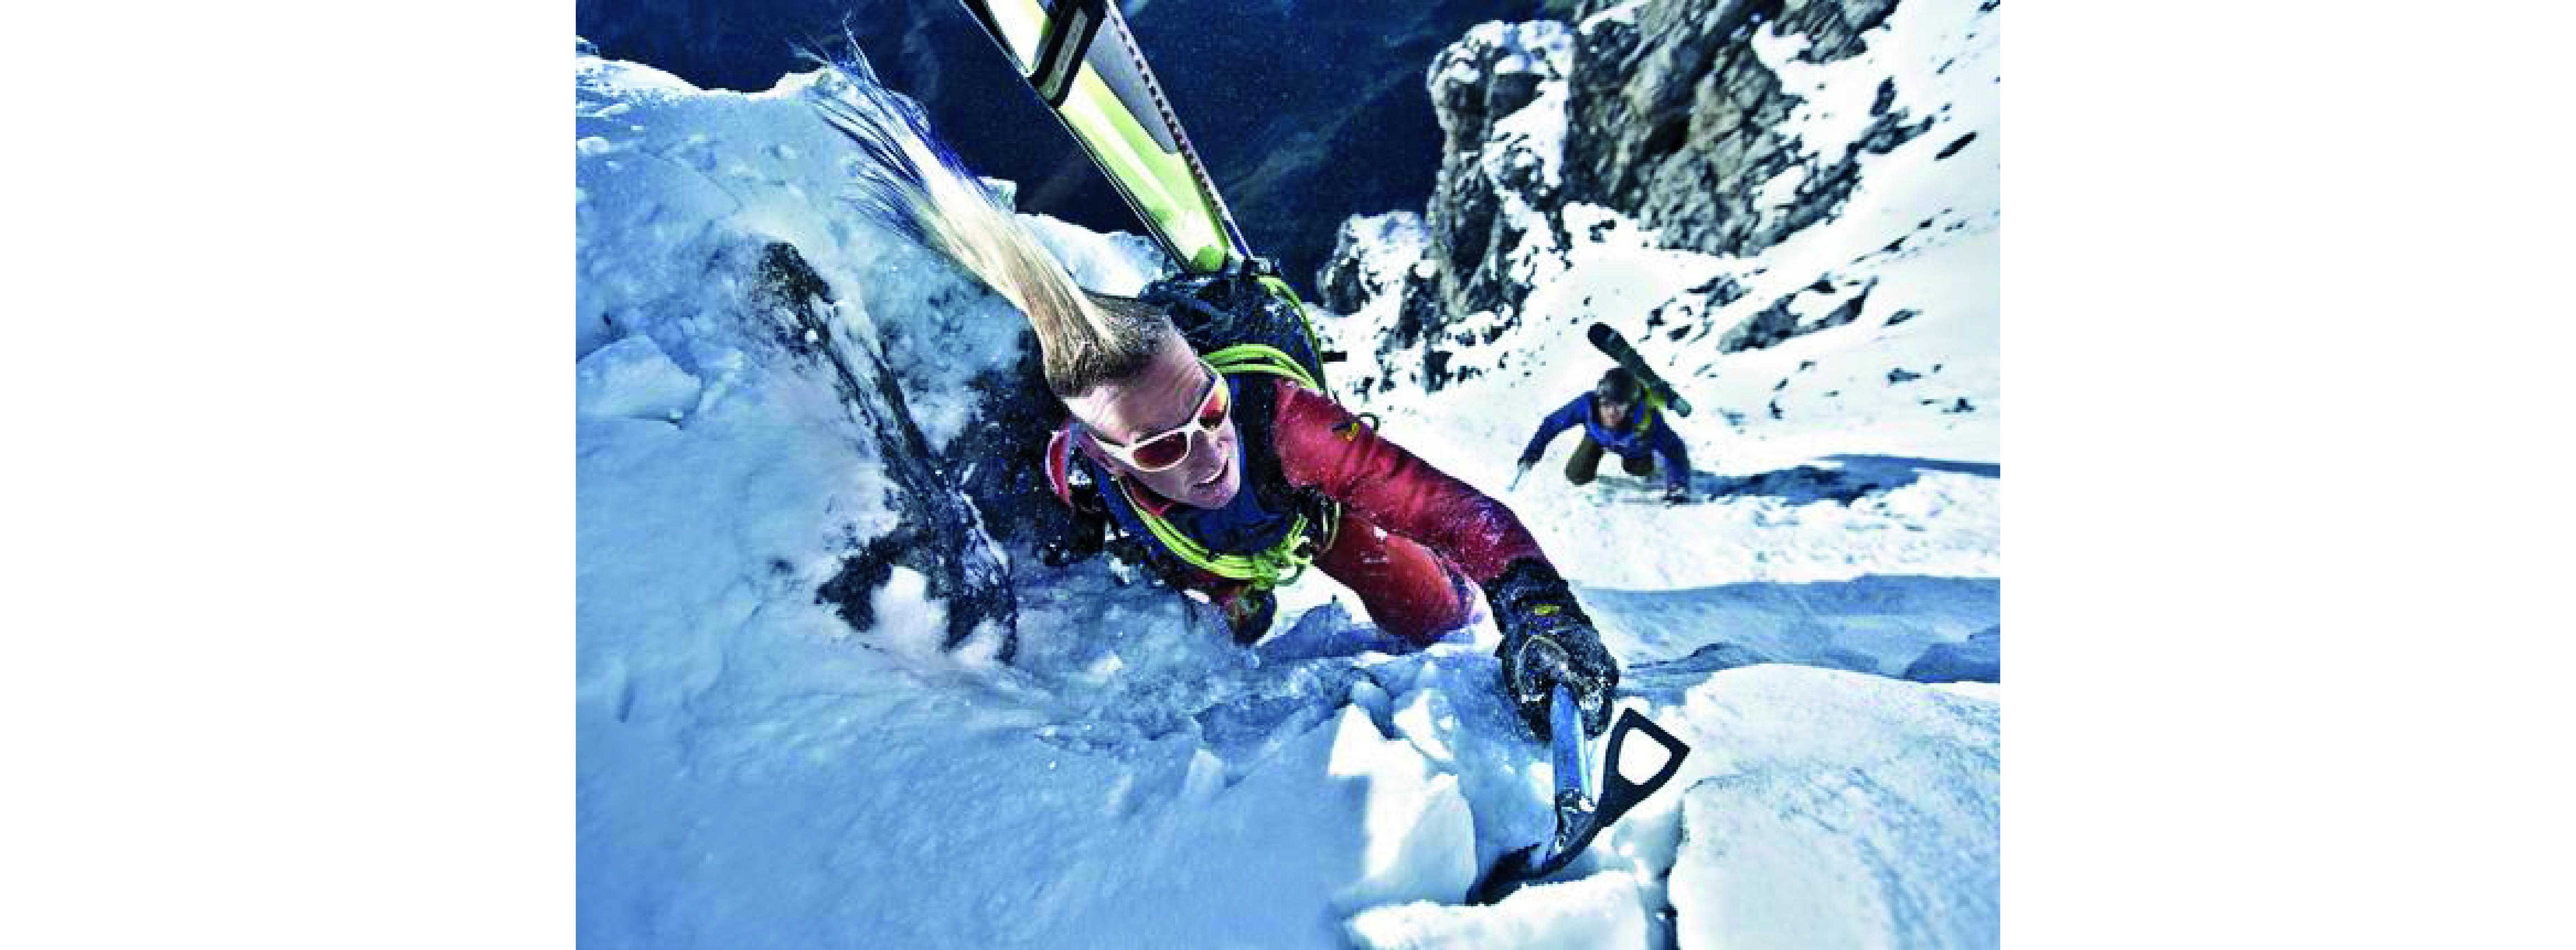 BIANCO Alpine Lifestyle Magazine, Winter 201415 by SPOT St